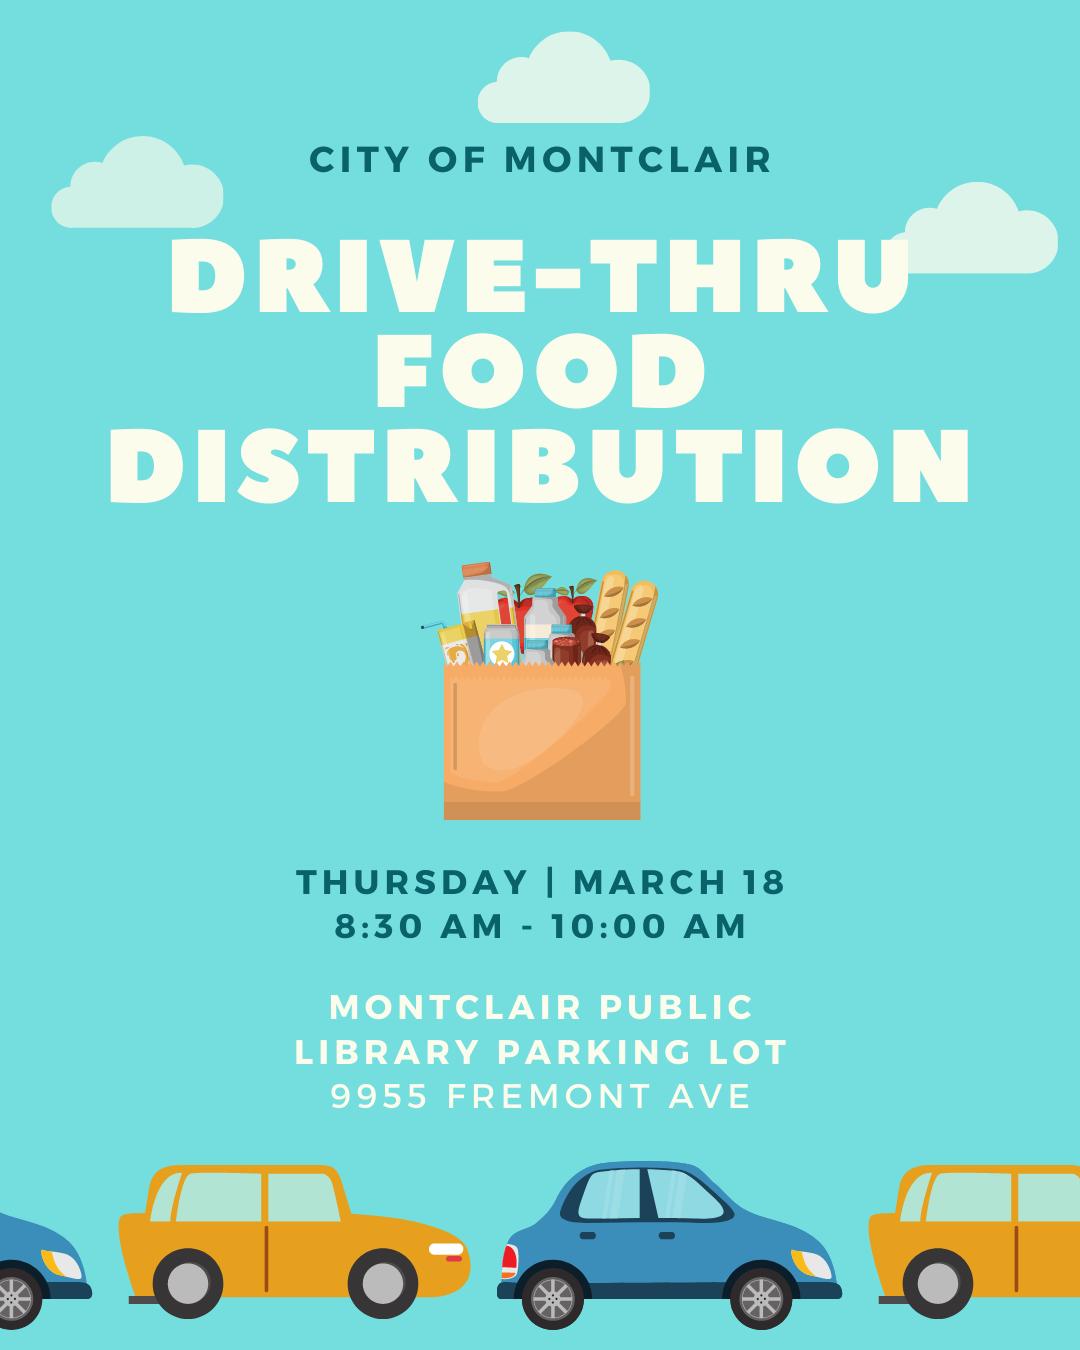 Food Distribution Thursday March 18, 8:30 to 10:00 a.m. in the Montclair Public Library parking lot, 9955 Fremont Avenue, Montclair, CA 91763